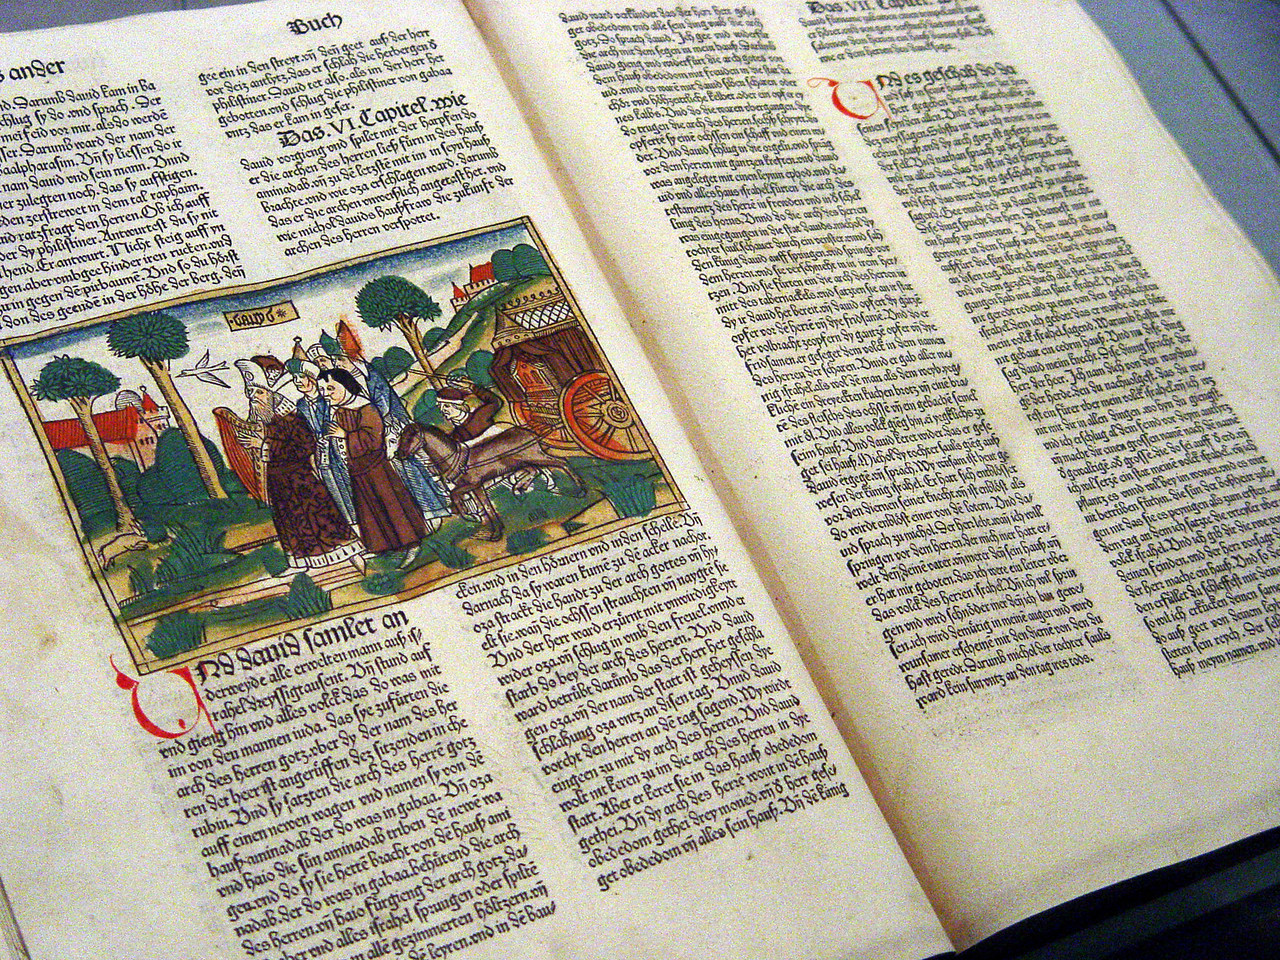 1483 edition of German Bible